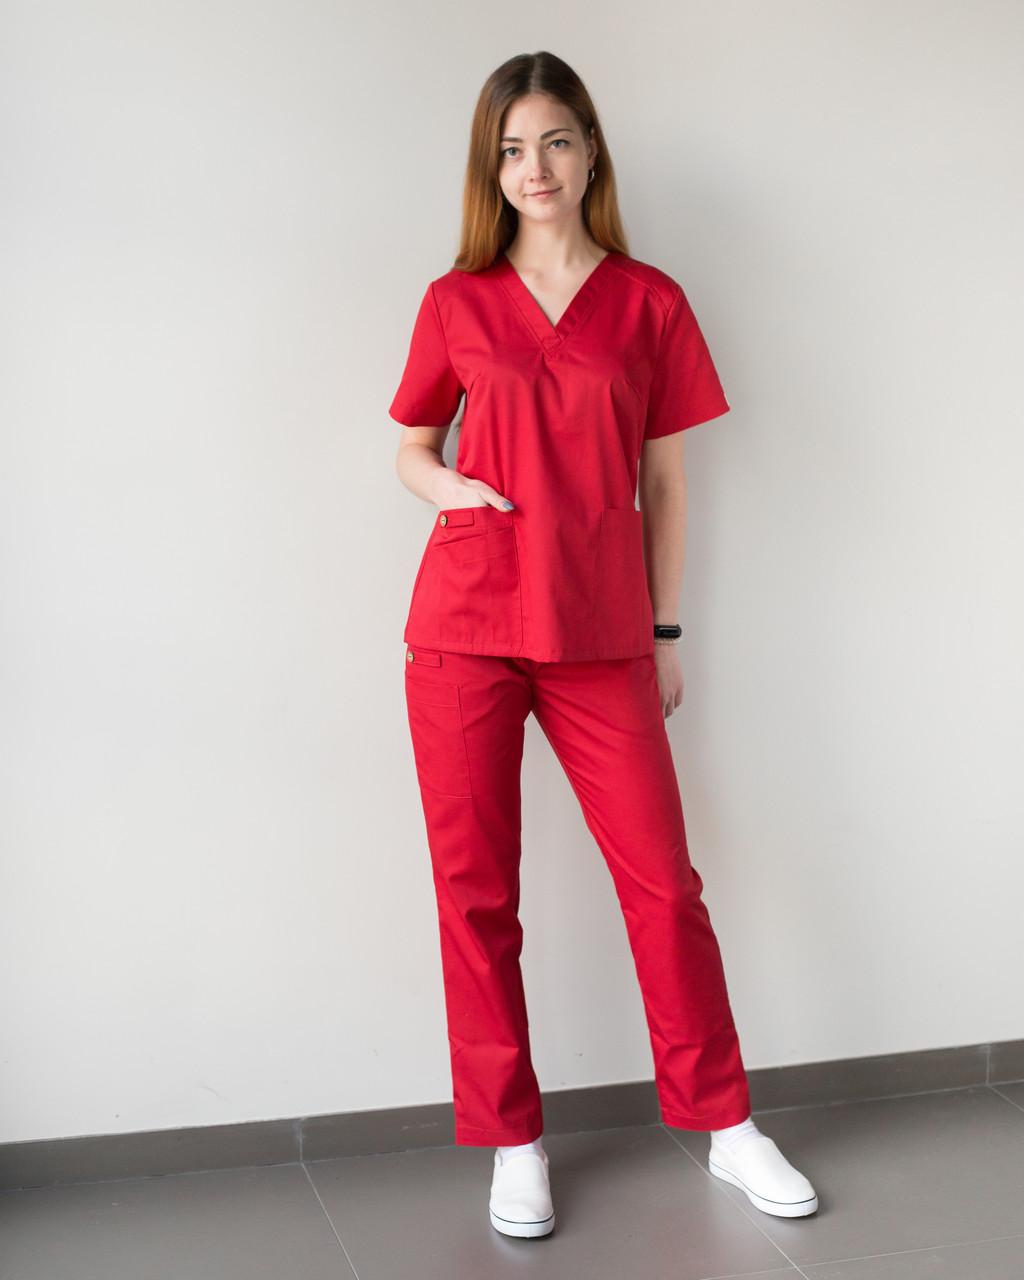 Медицинский женский костюм Toronto red 42,44